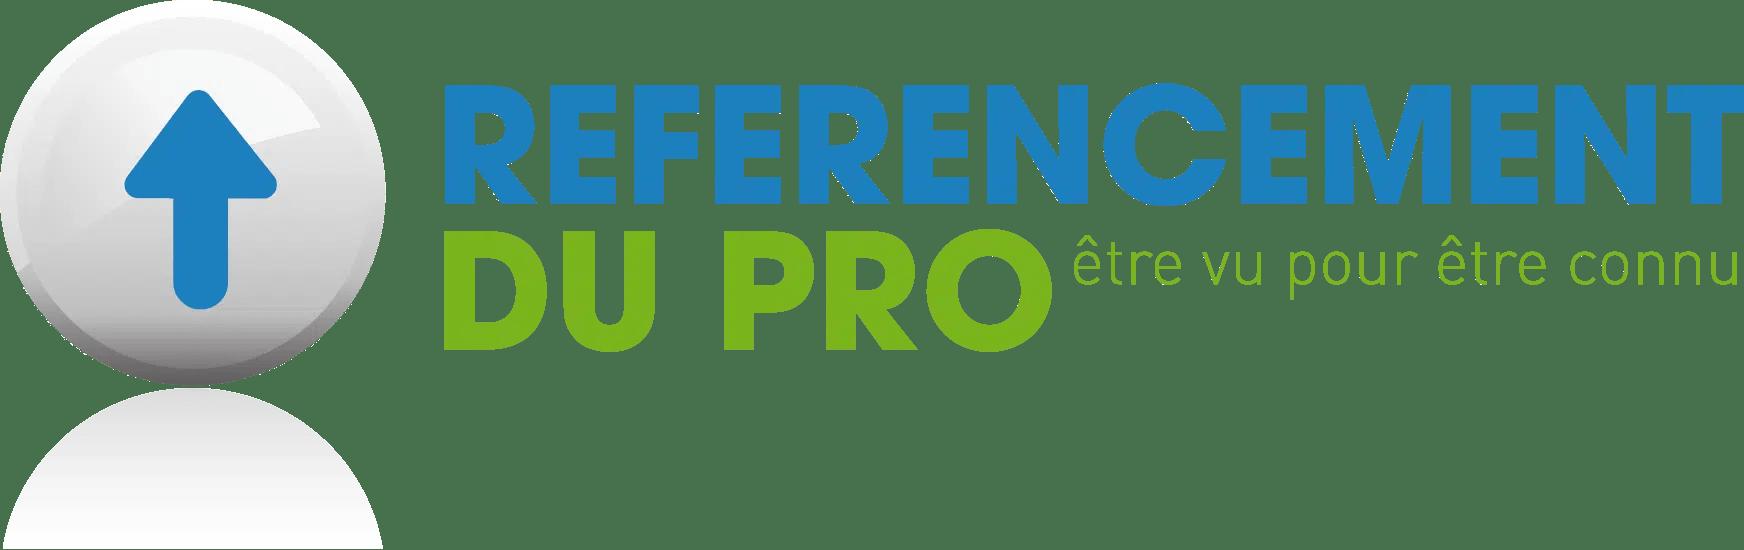 https://i1.wp.com/www.referencement-du-pro.com/wp-content/uploads/logo-ref-ok.png?fit=1744%2C550&ssl=1